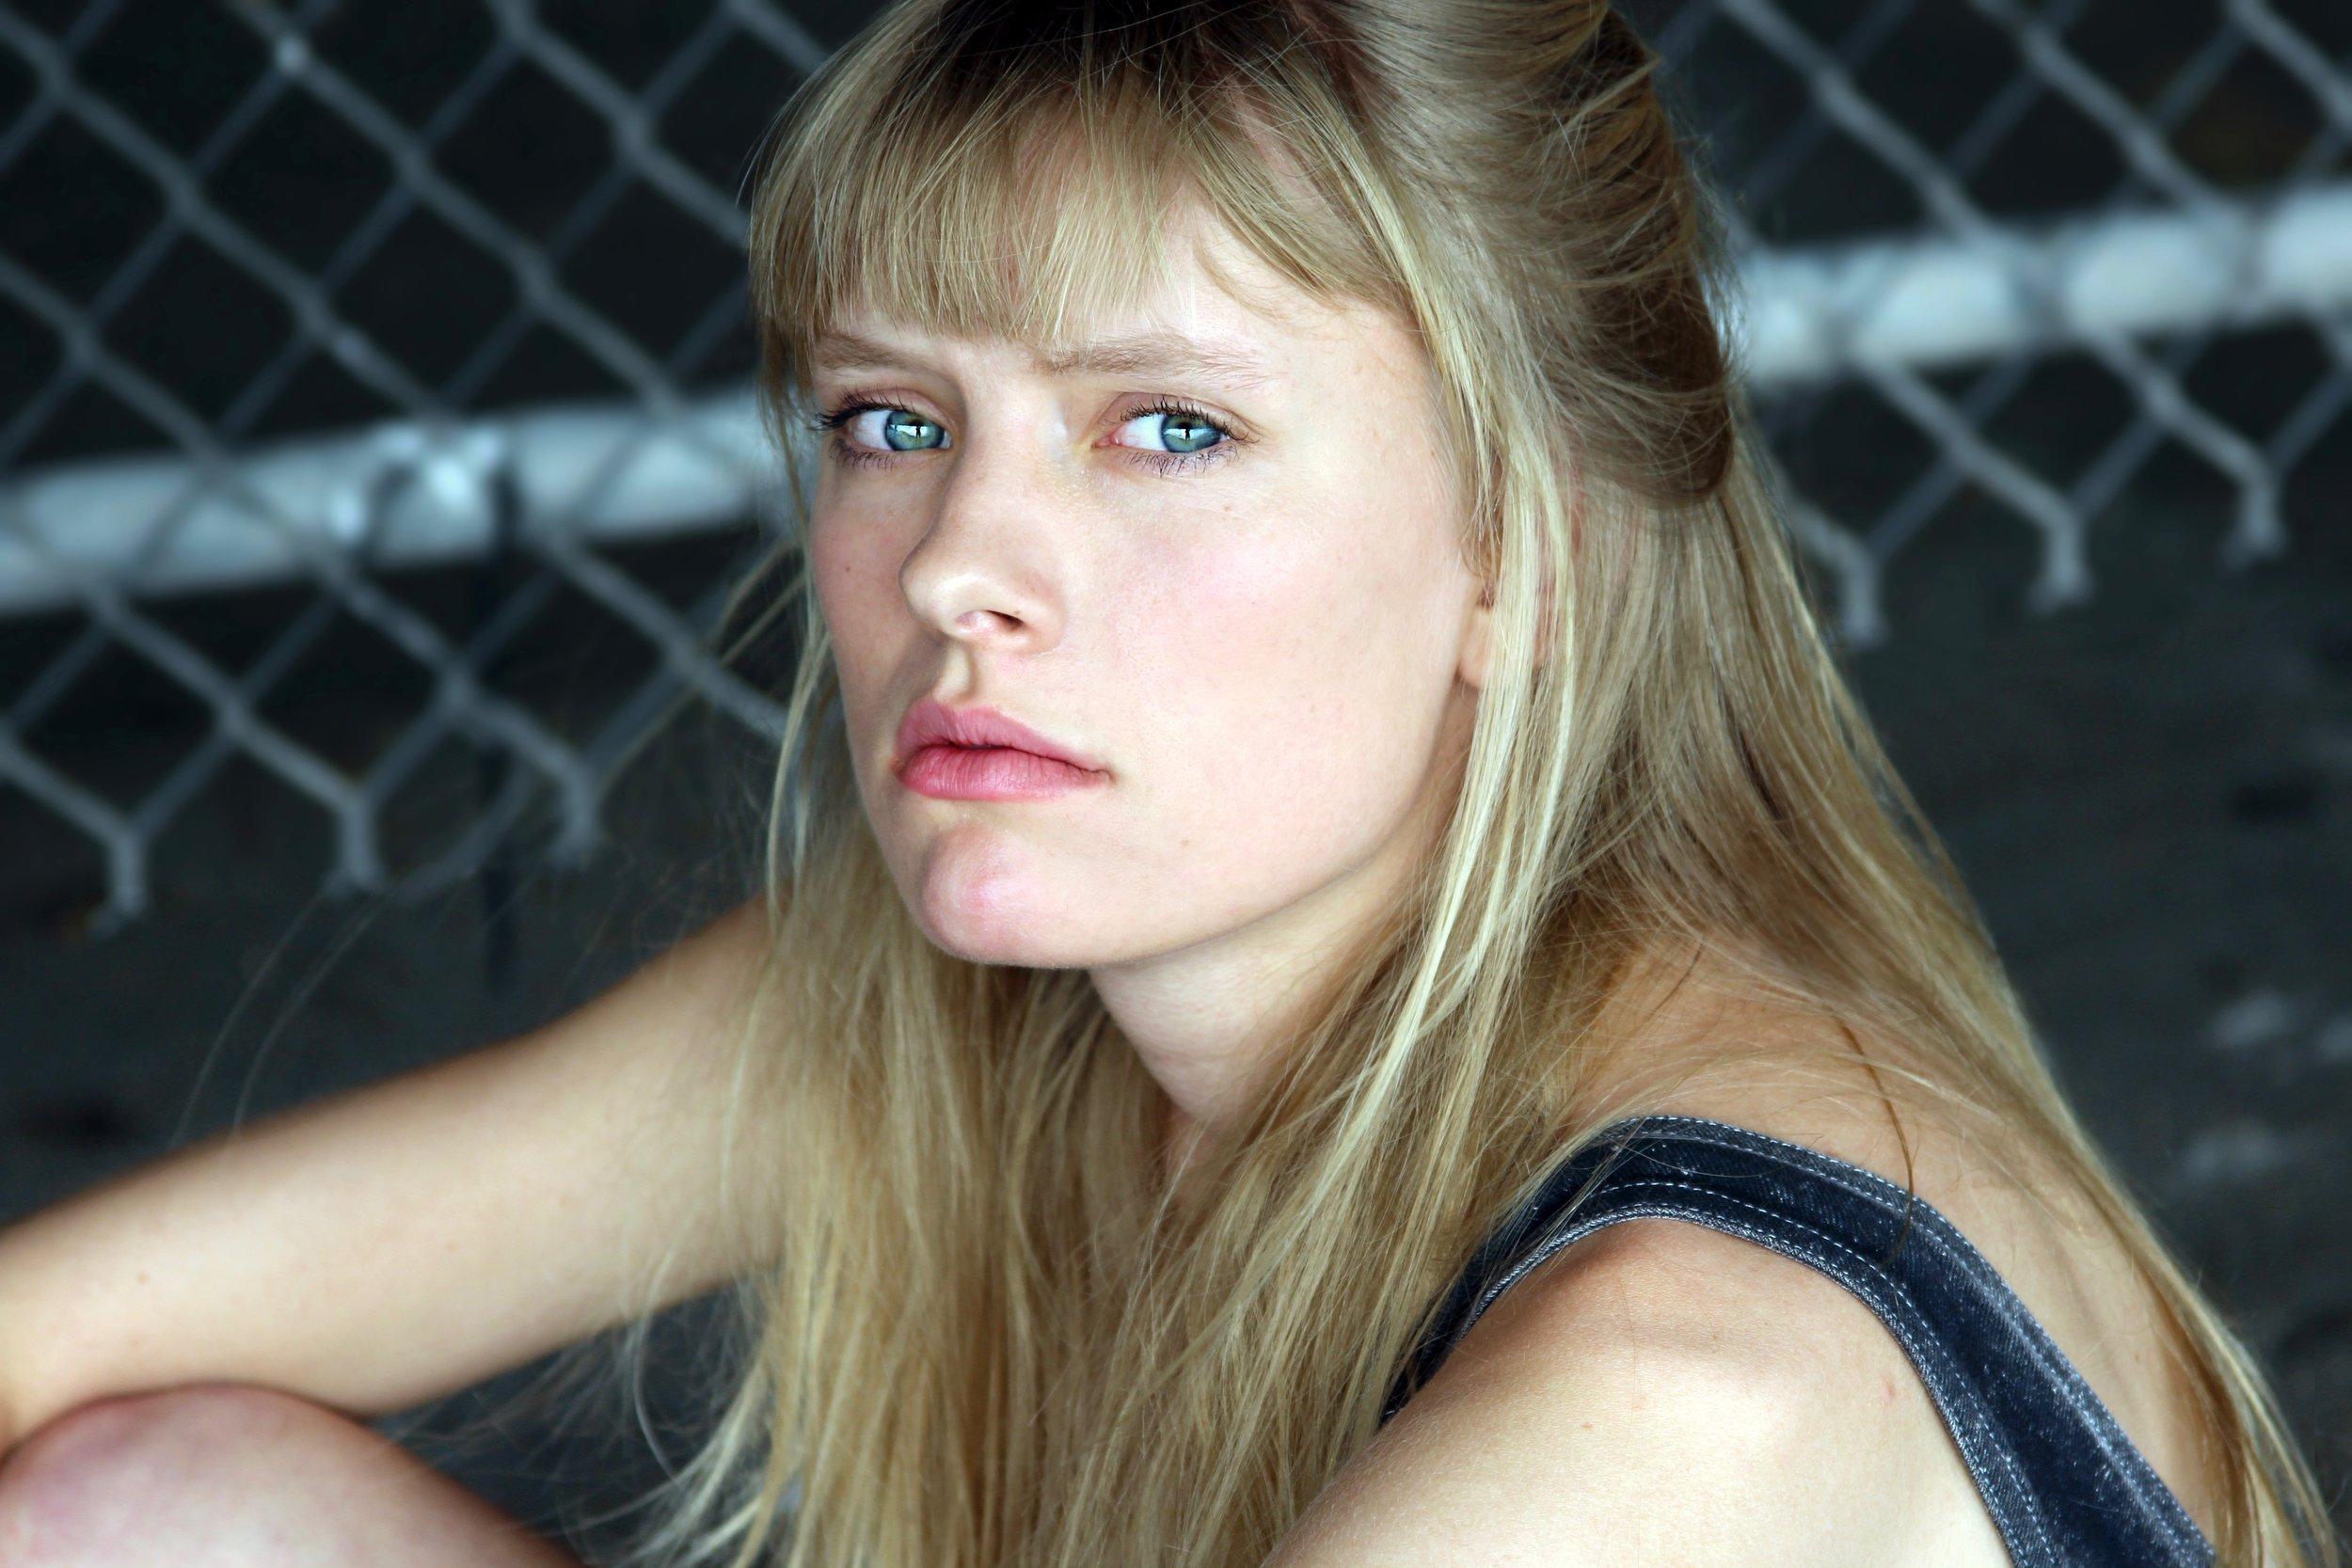 Sarah Durn Headshot - Troubled Look.jpg